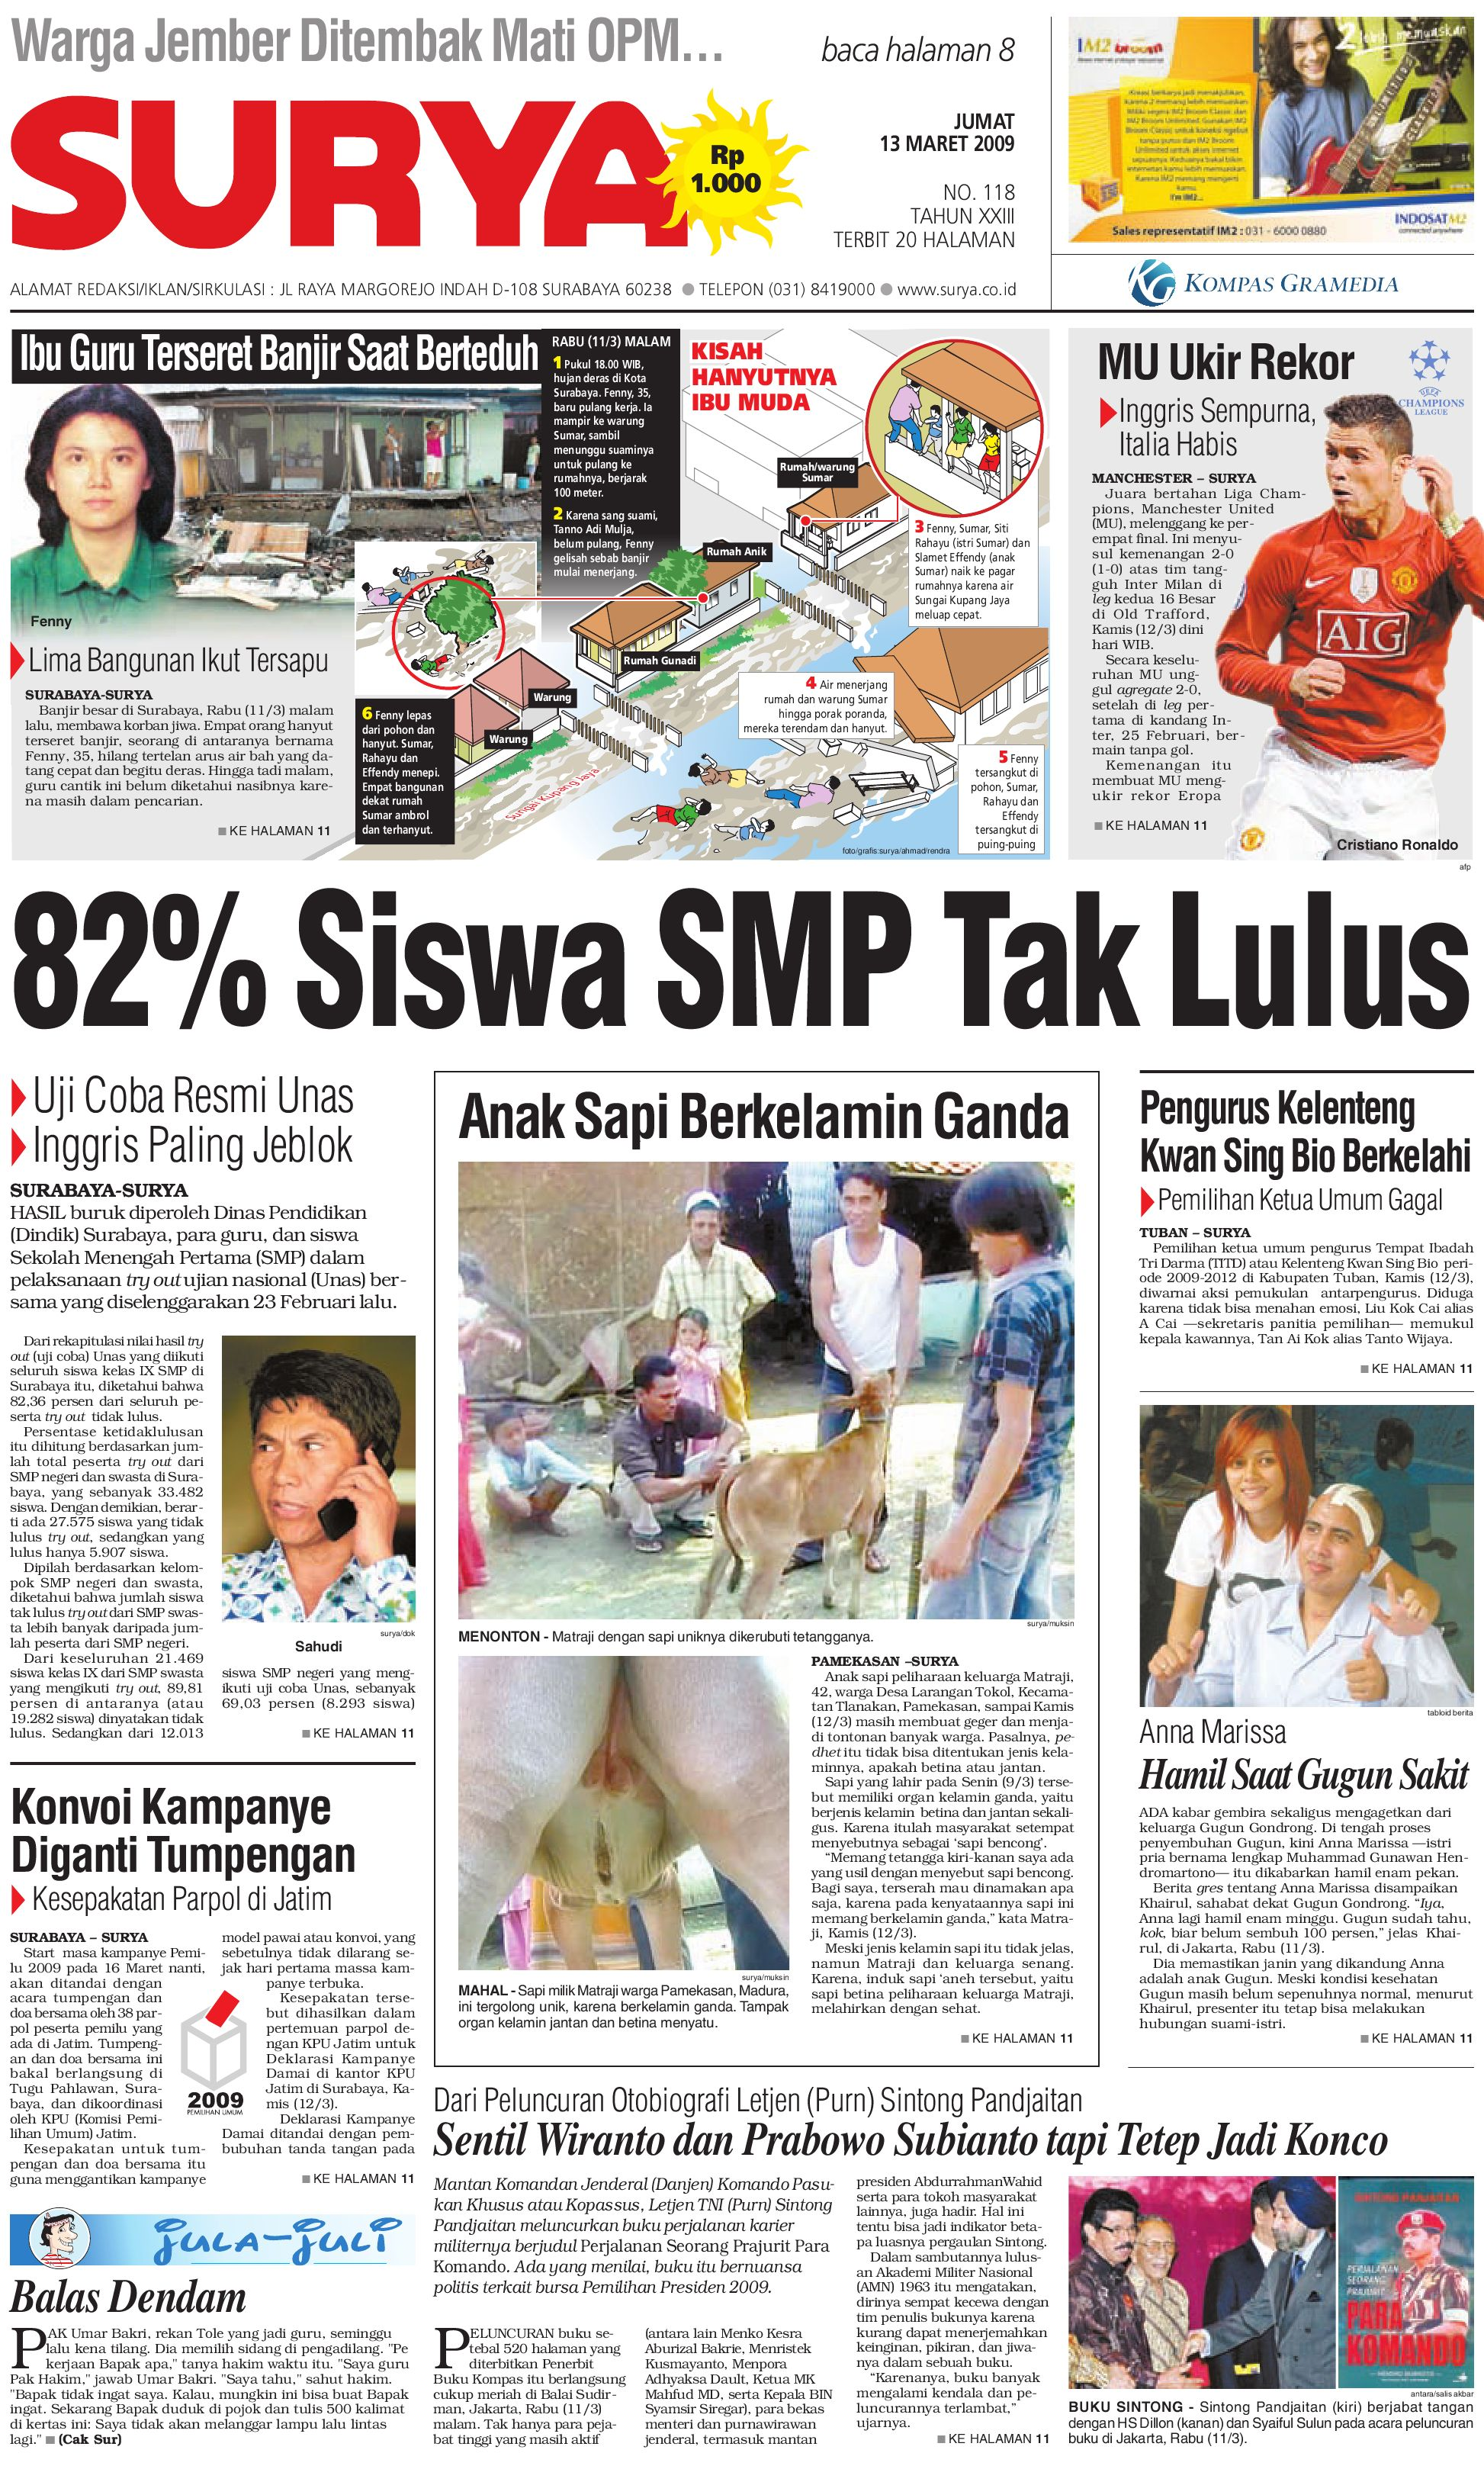 Edisi Cetak 13 Maret 2009 By Harian Surya Issuu Produk Ukm Bumn Batik Tulis Babon Angrem